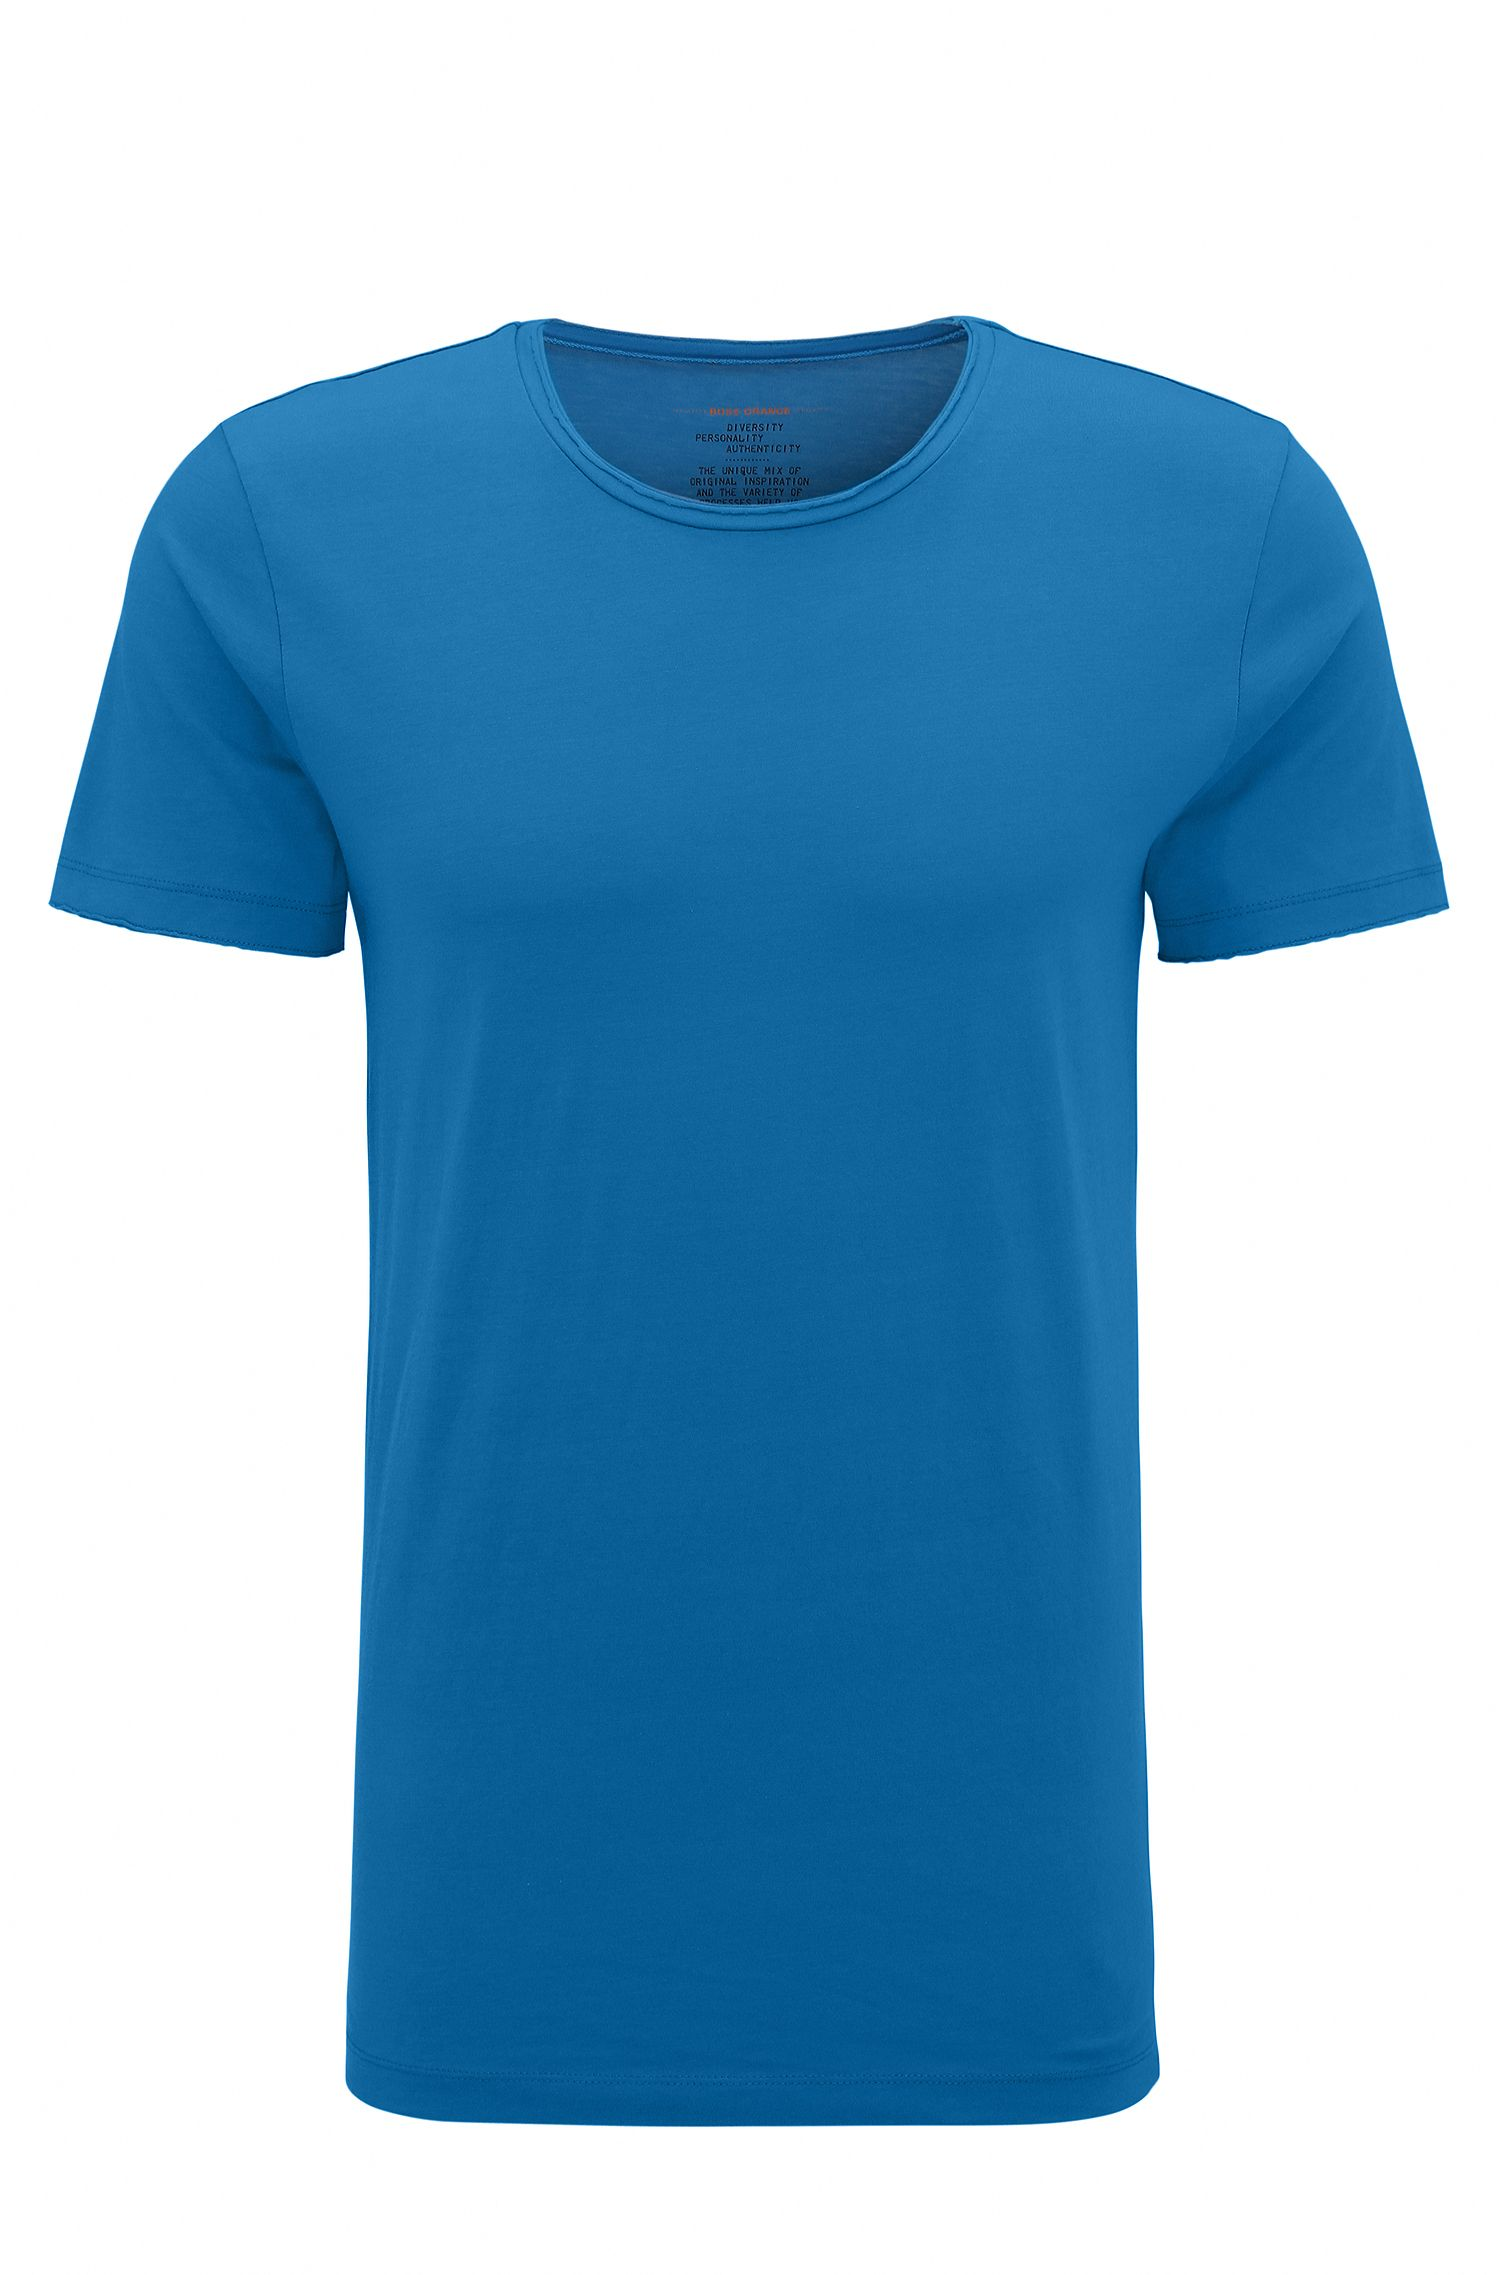 Regular-Fit T-Shirt mit offenen Abschlüssen